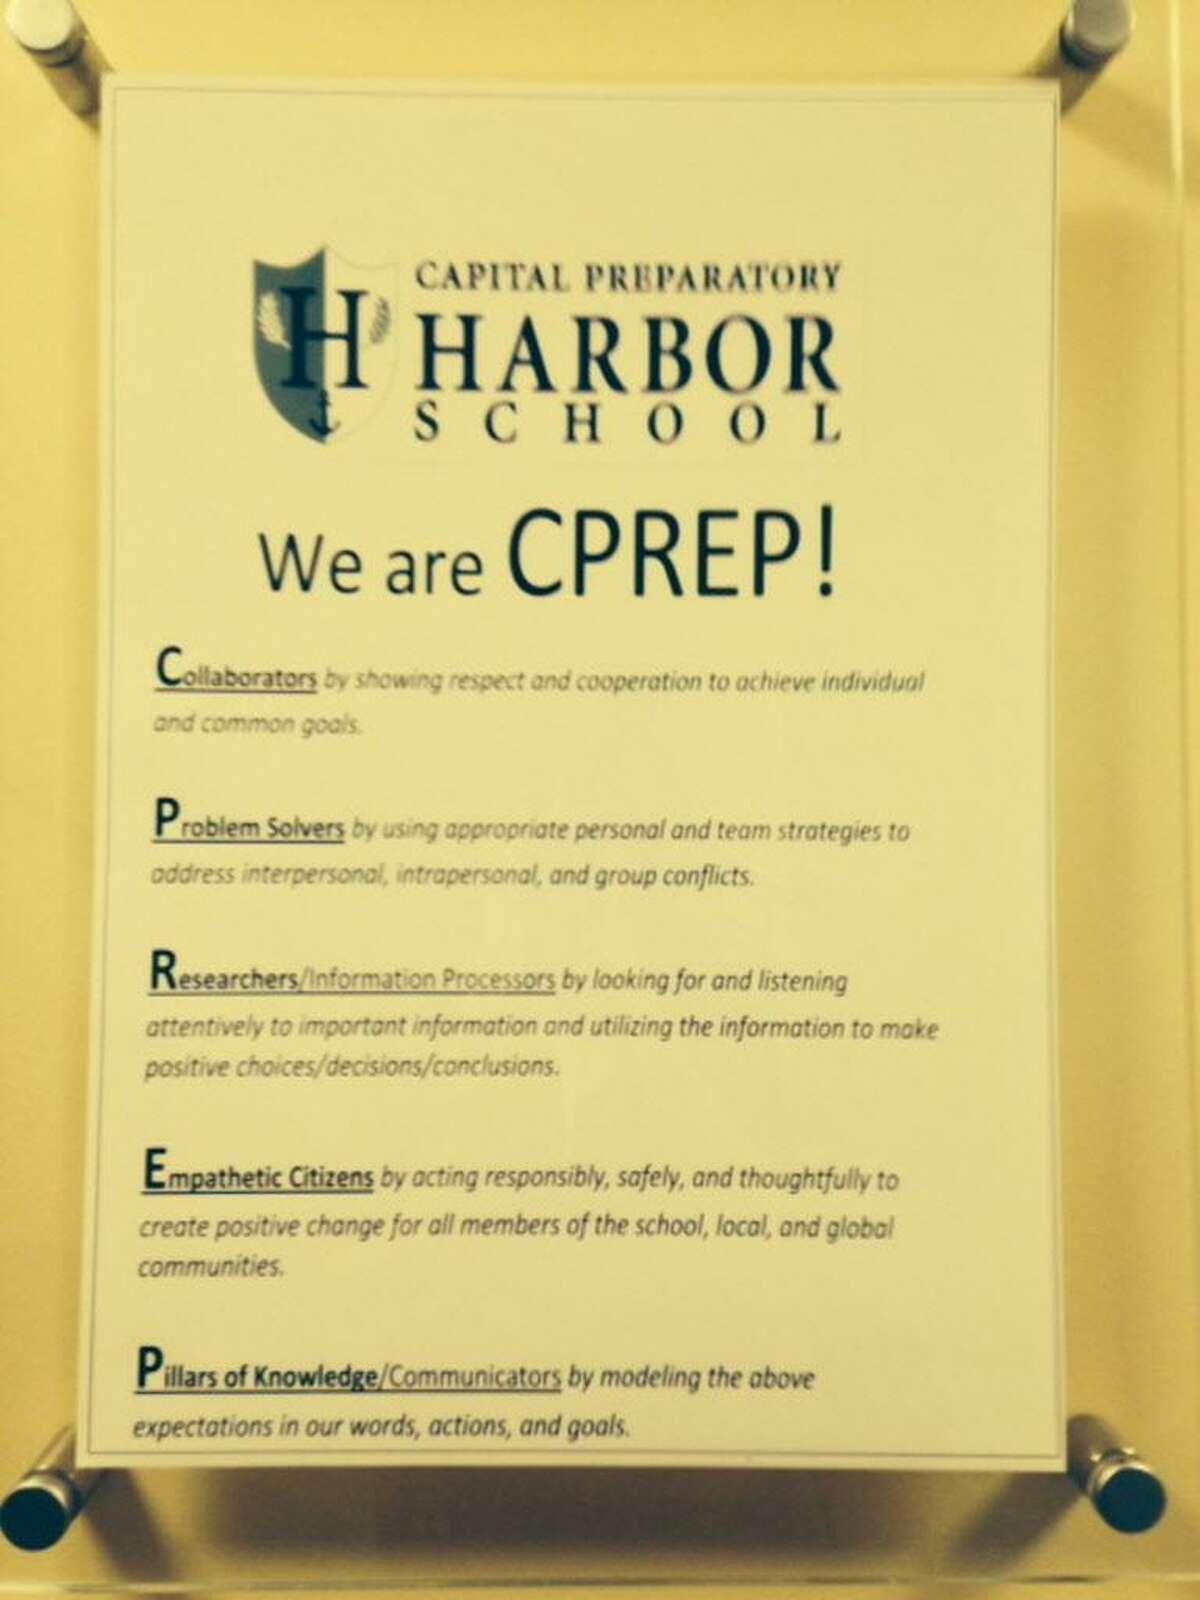 Capital Prep Harbor School, first day, August 24, 2015, Main Street Bridgeport